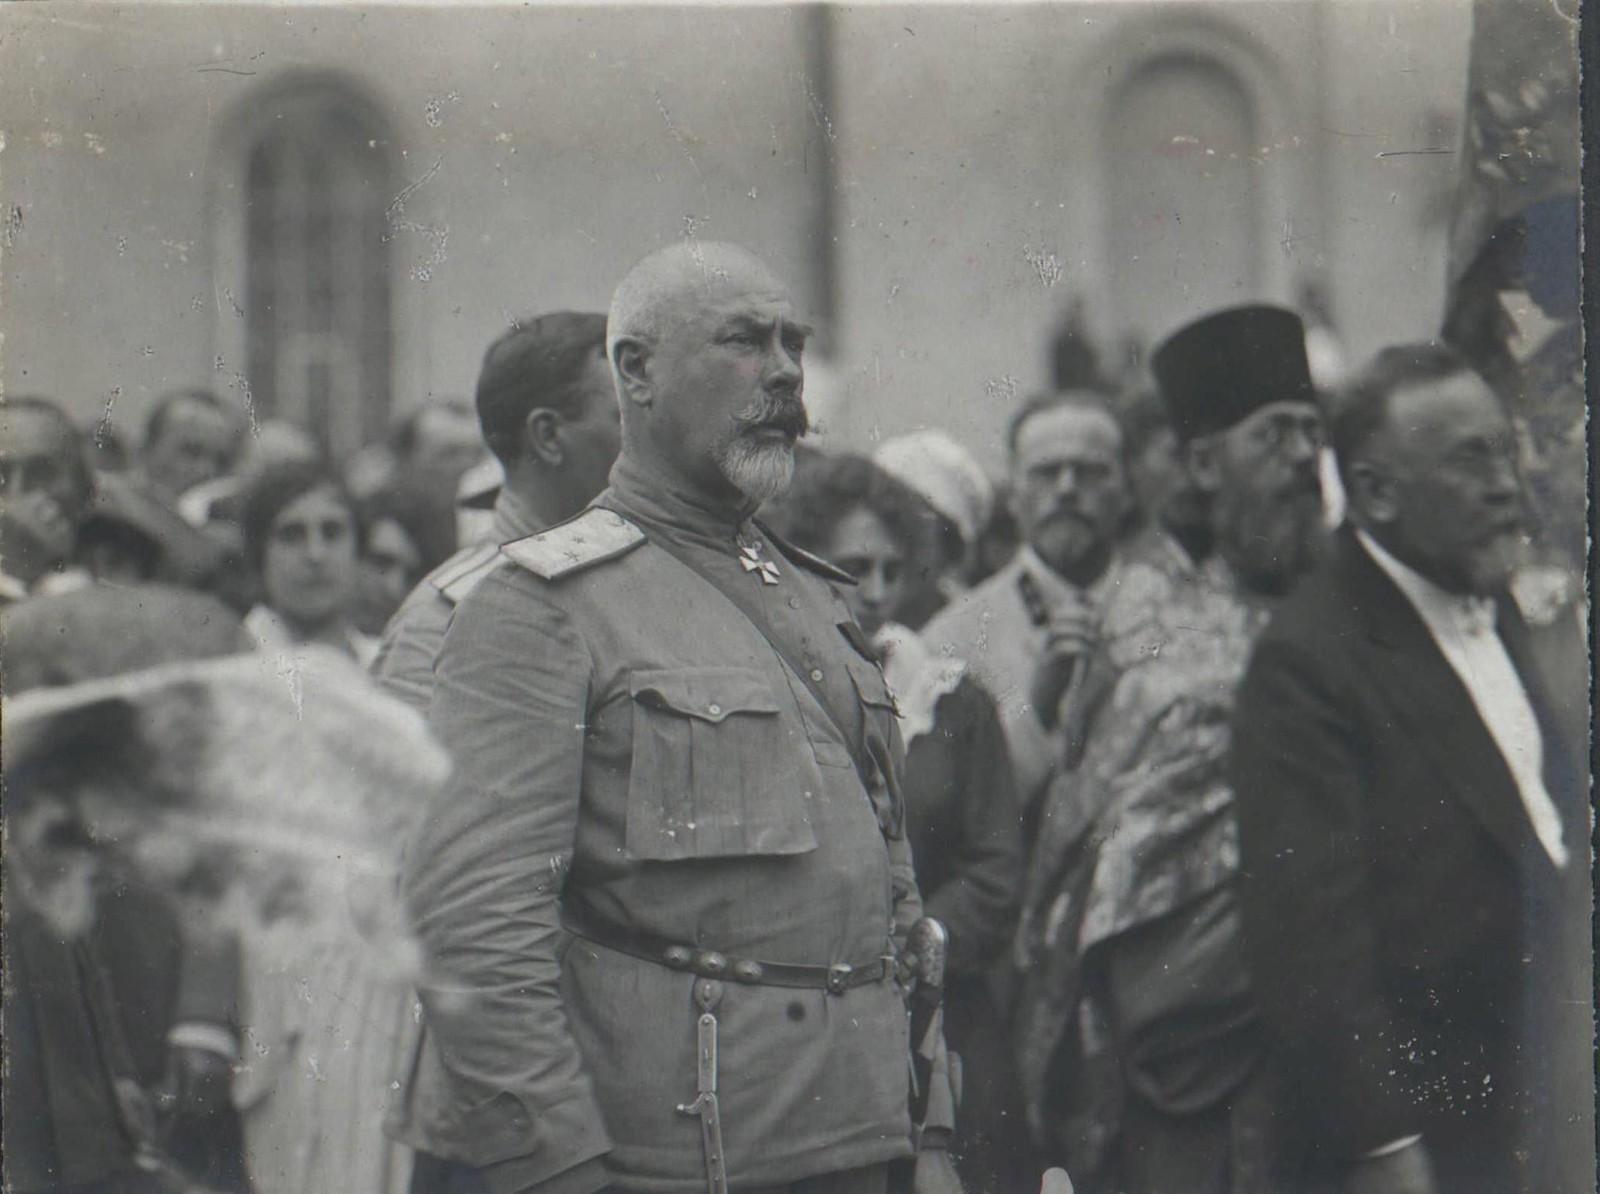 173. 1919. Генерал А.И.Деникин в Харькове на параде